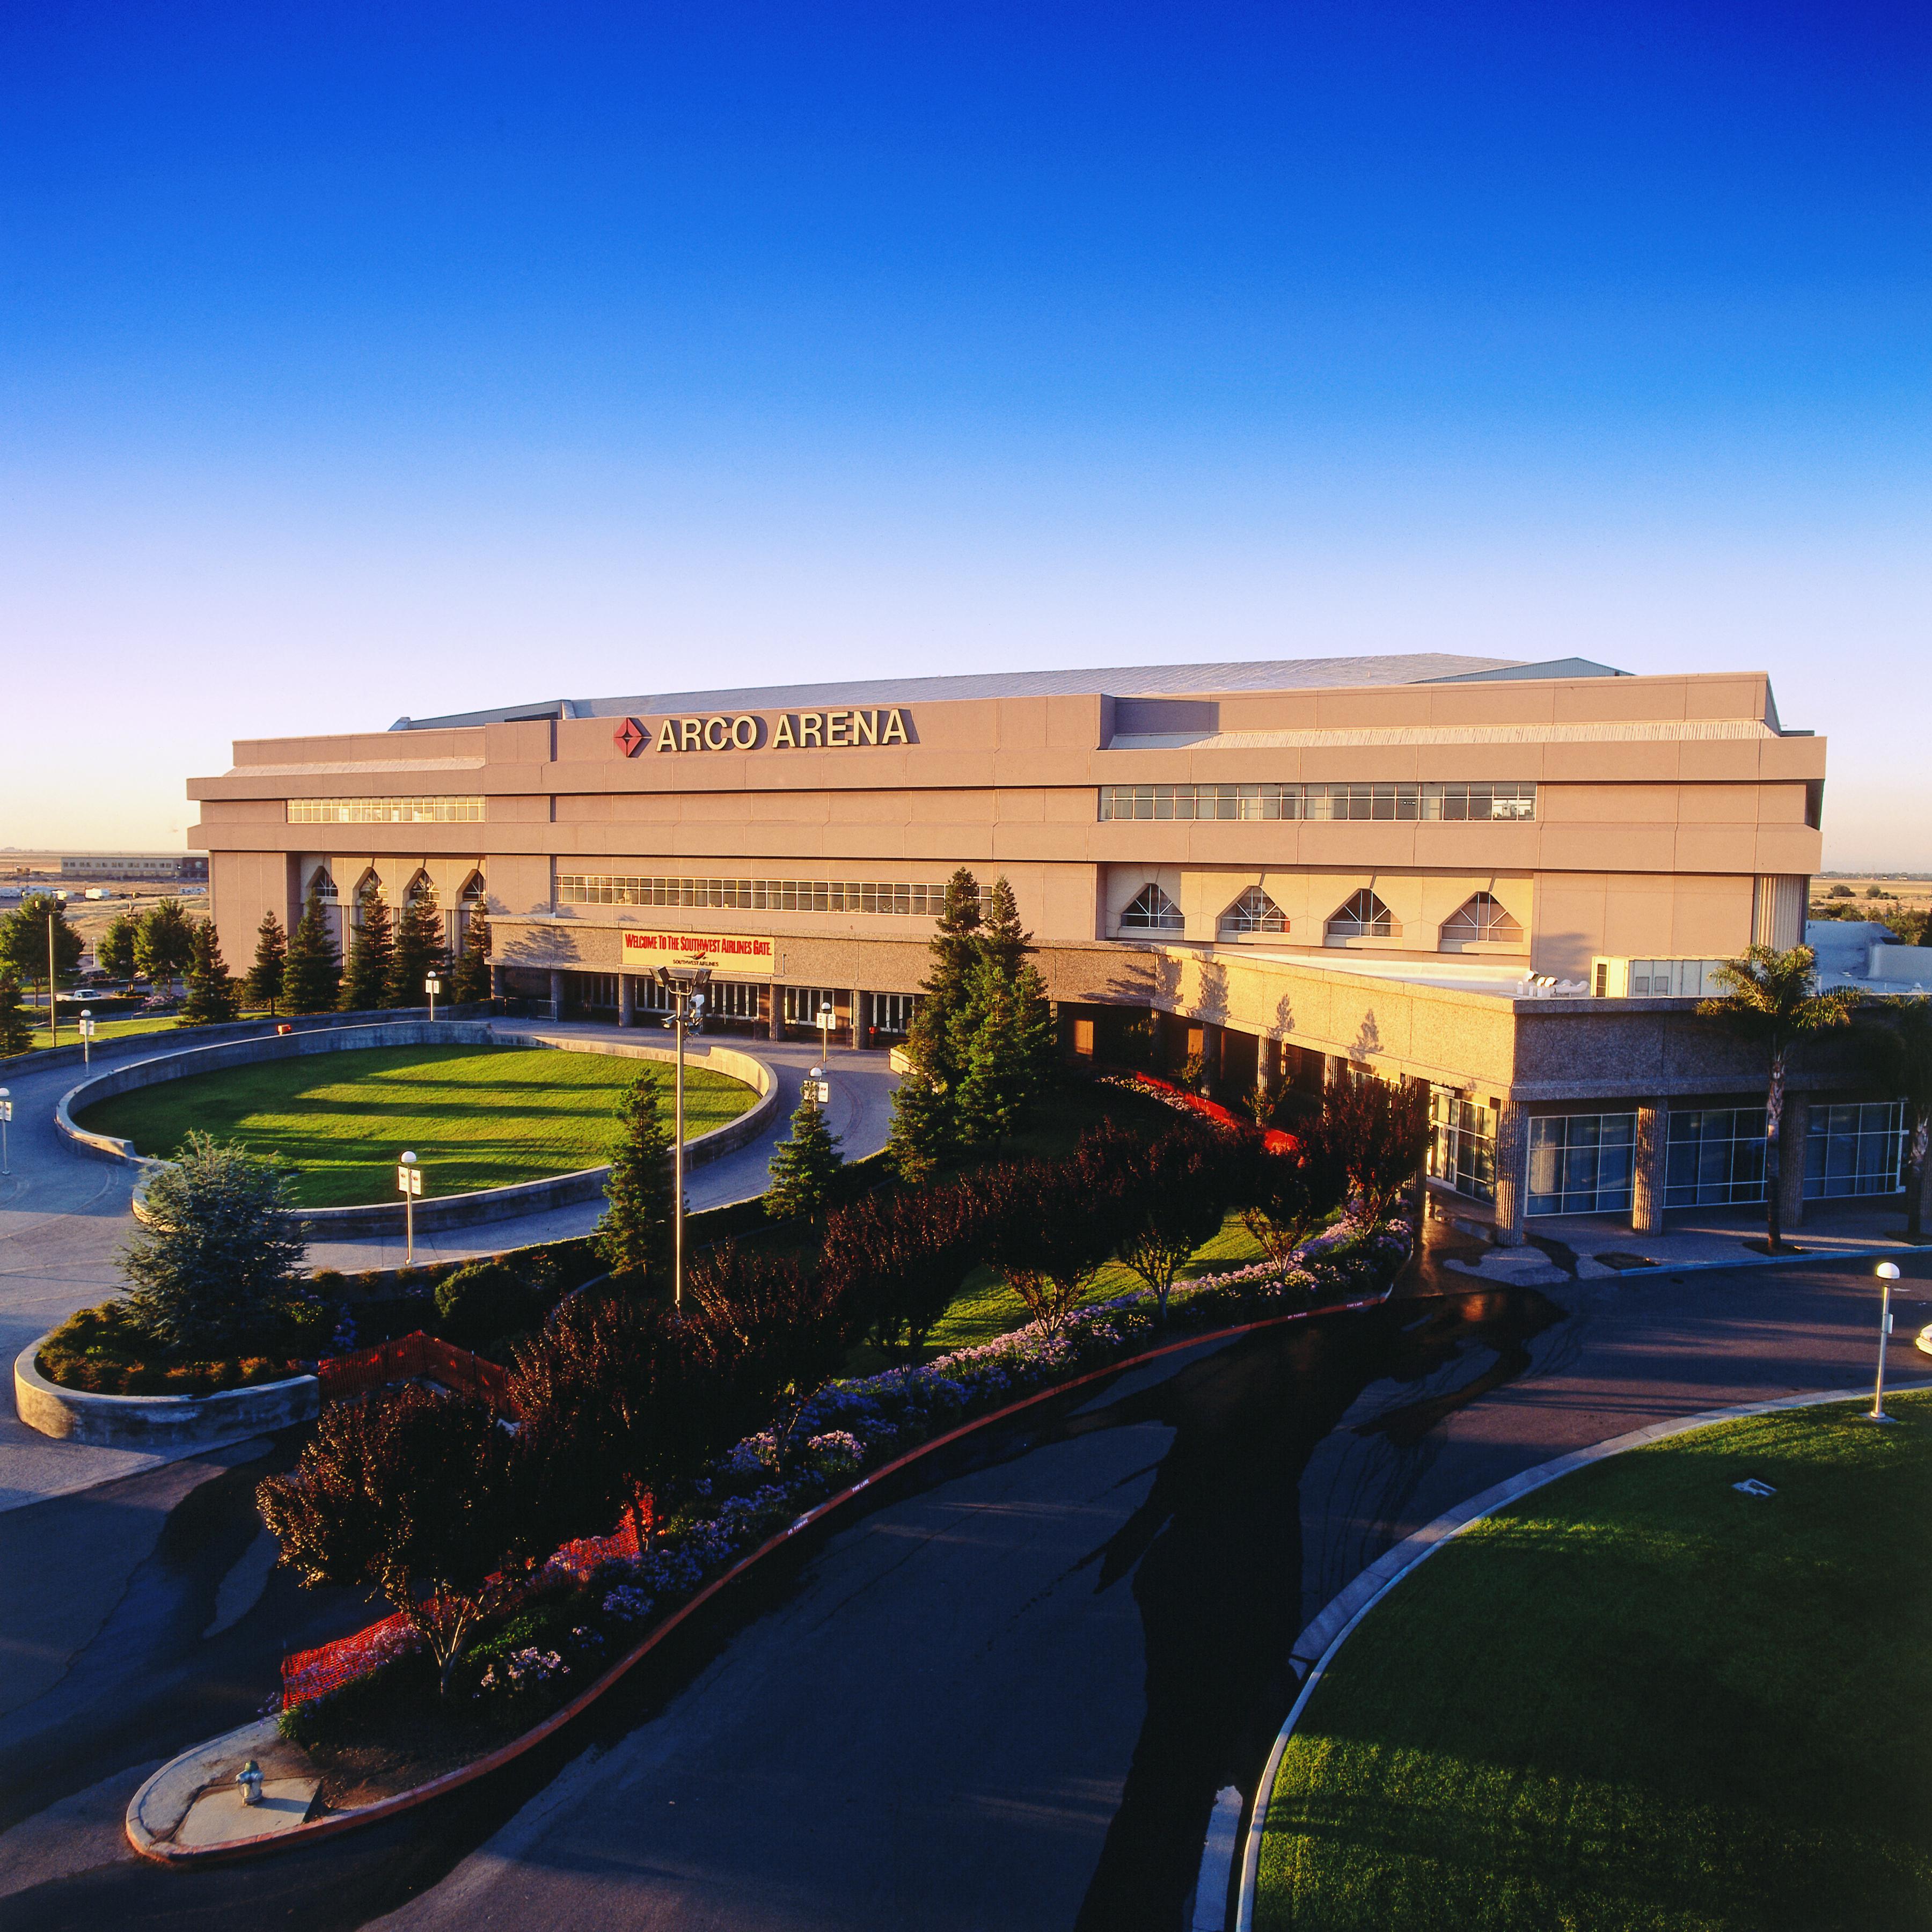 Sacramento Kings Arco Arena Exterior View